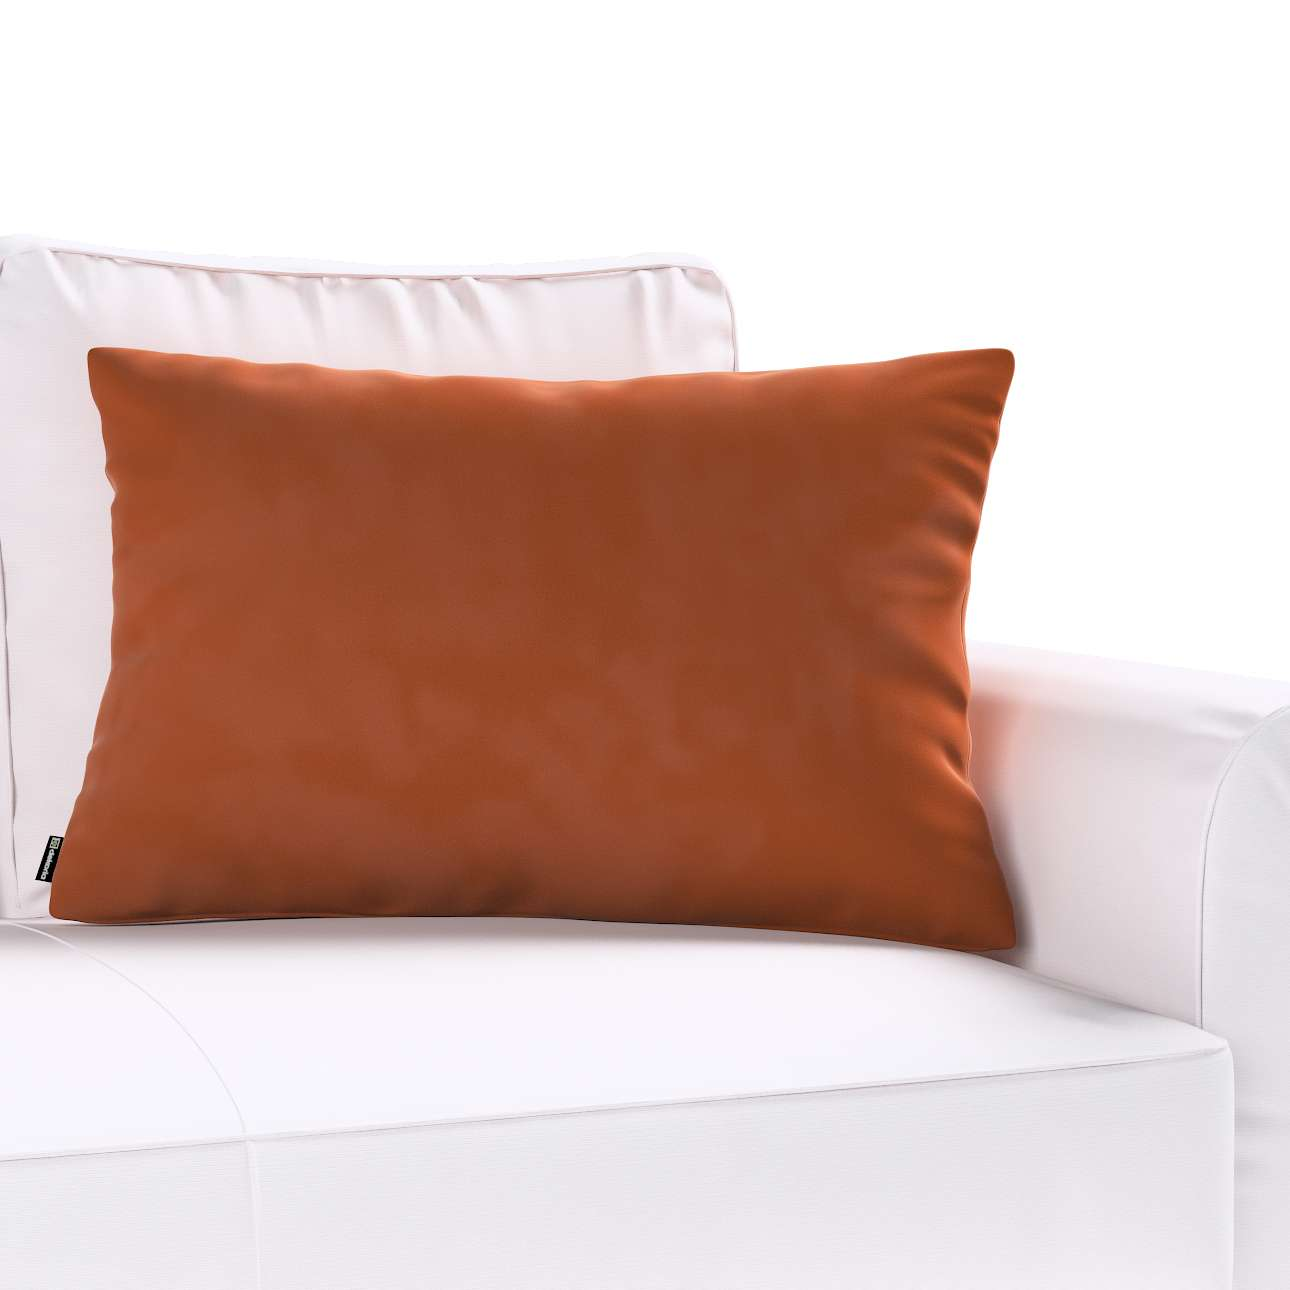 Kinga cushion cover 60x40cm in collection Velvet, fabric: 704-33